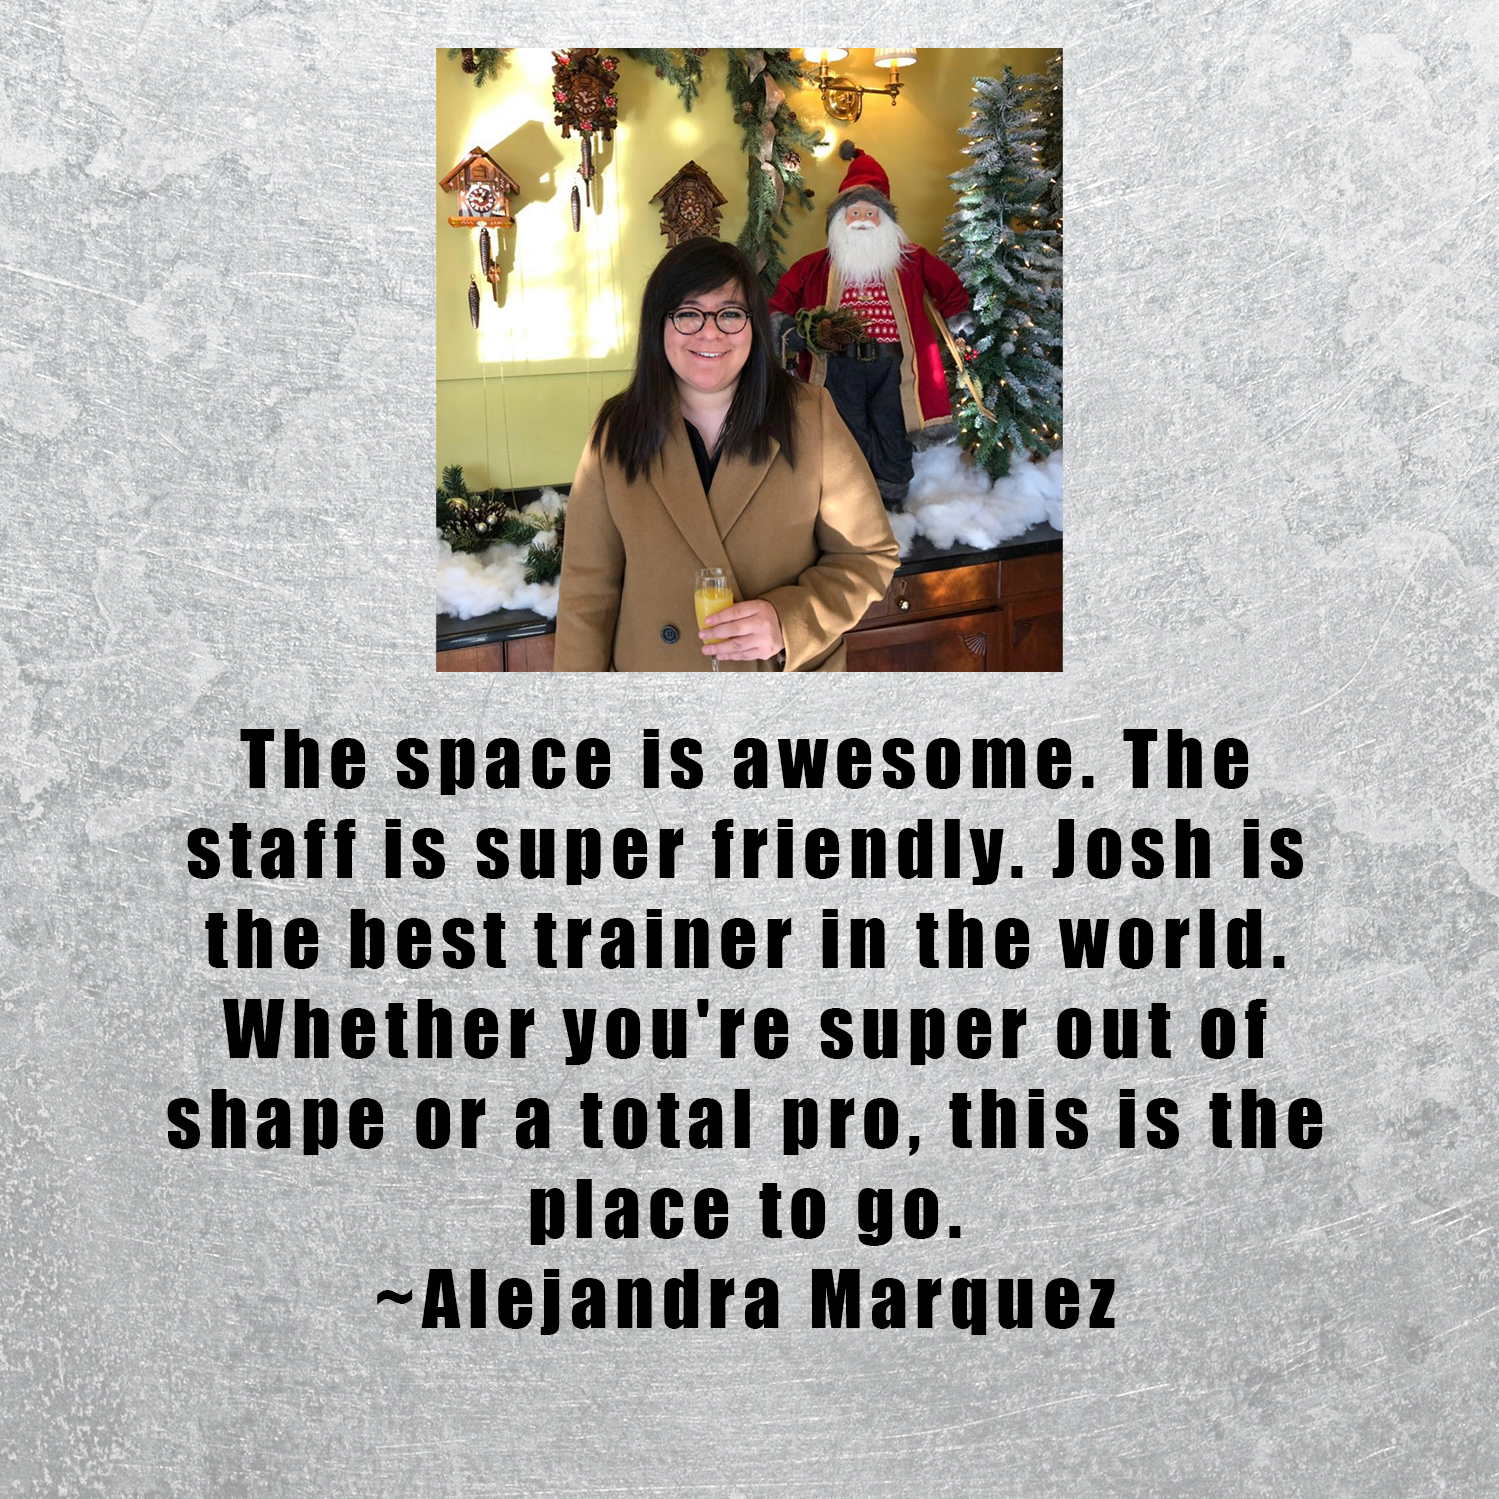 Alejandra Marquez.jpg